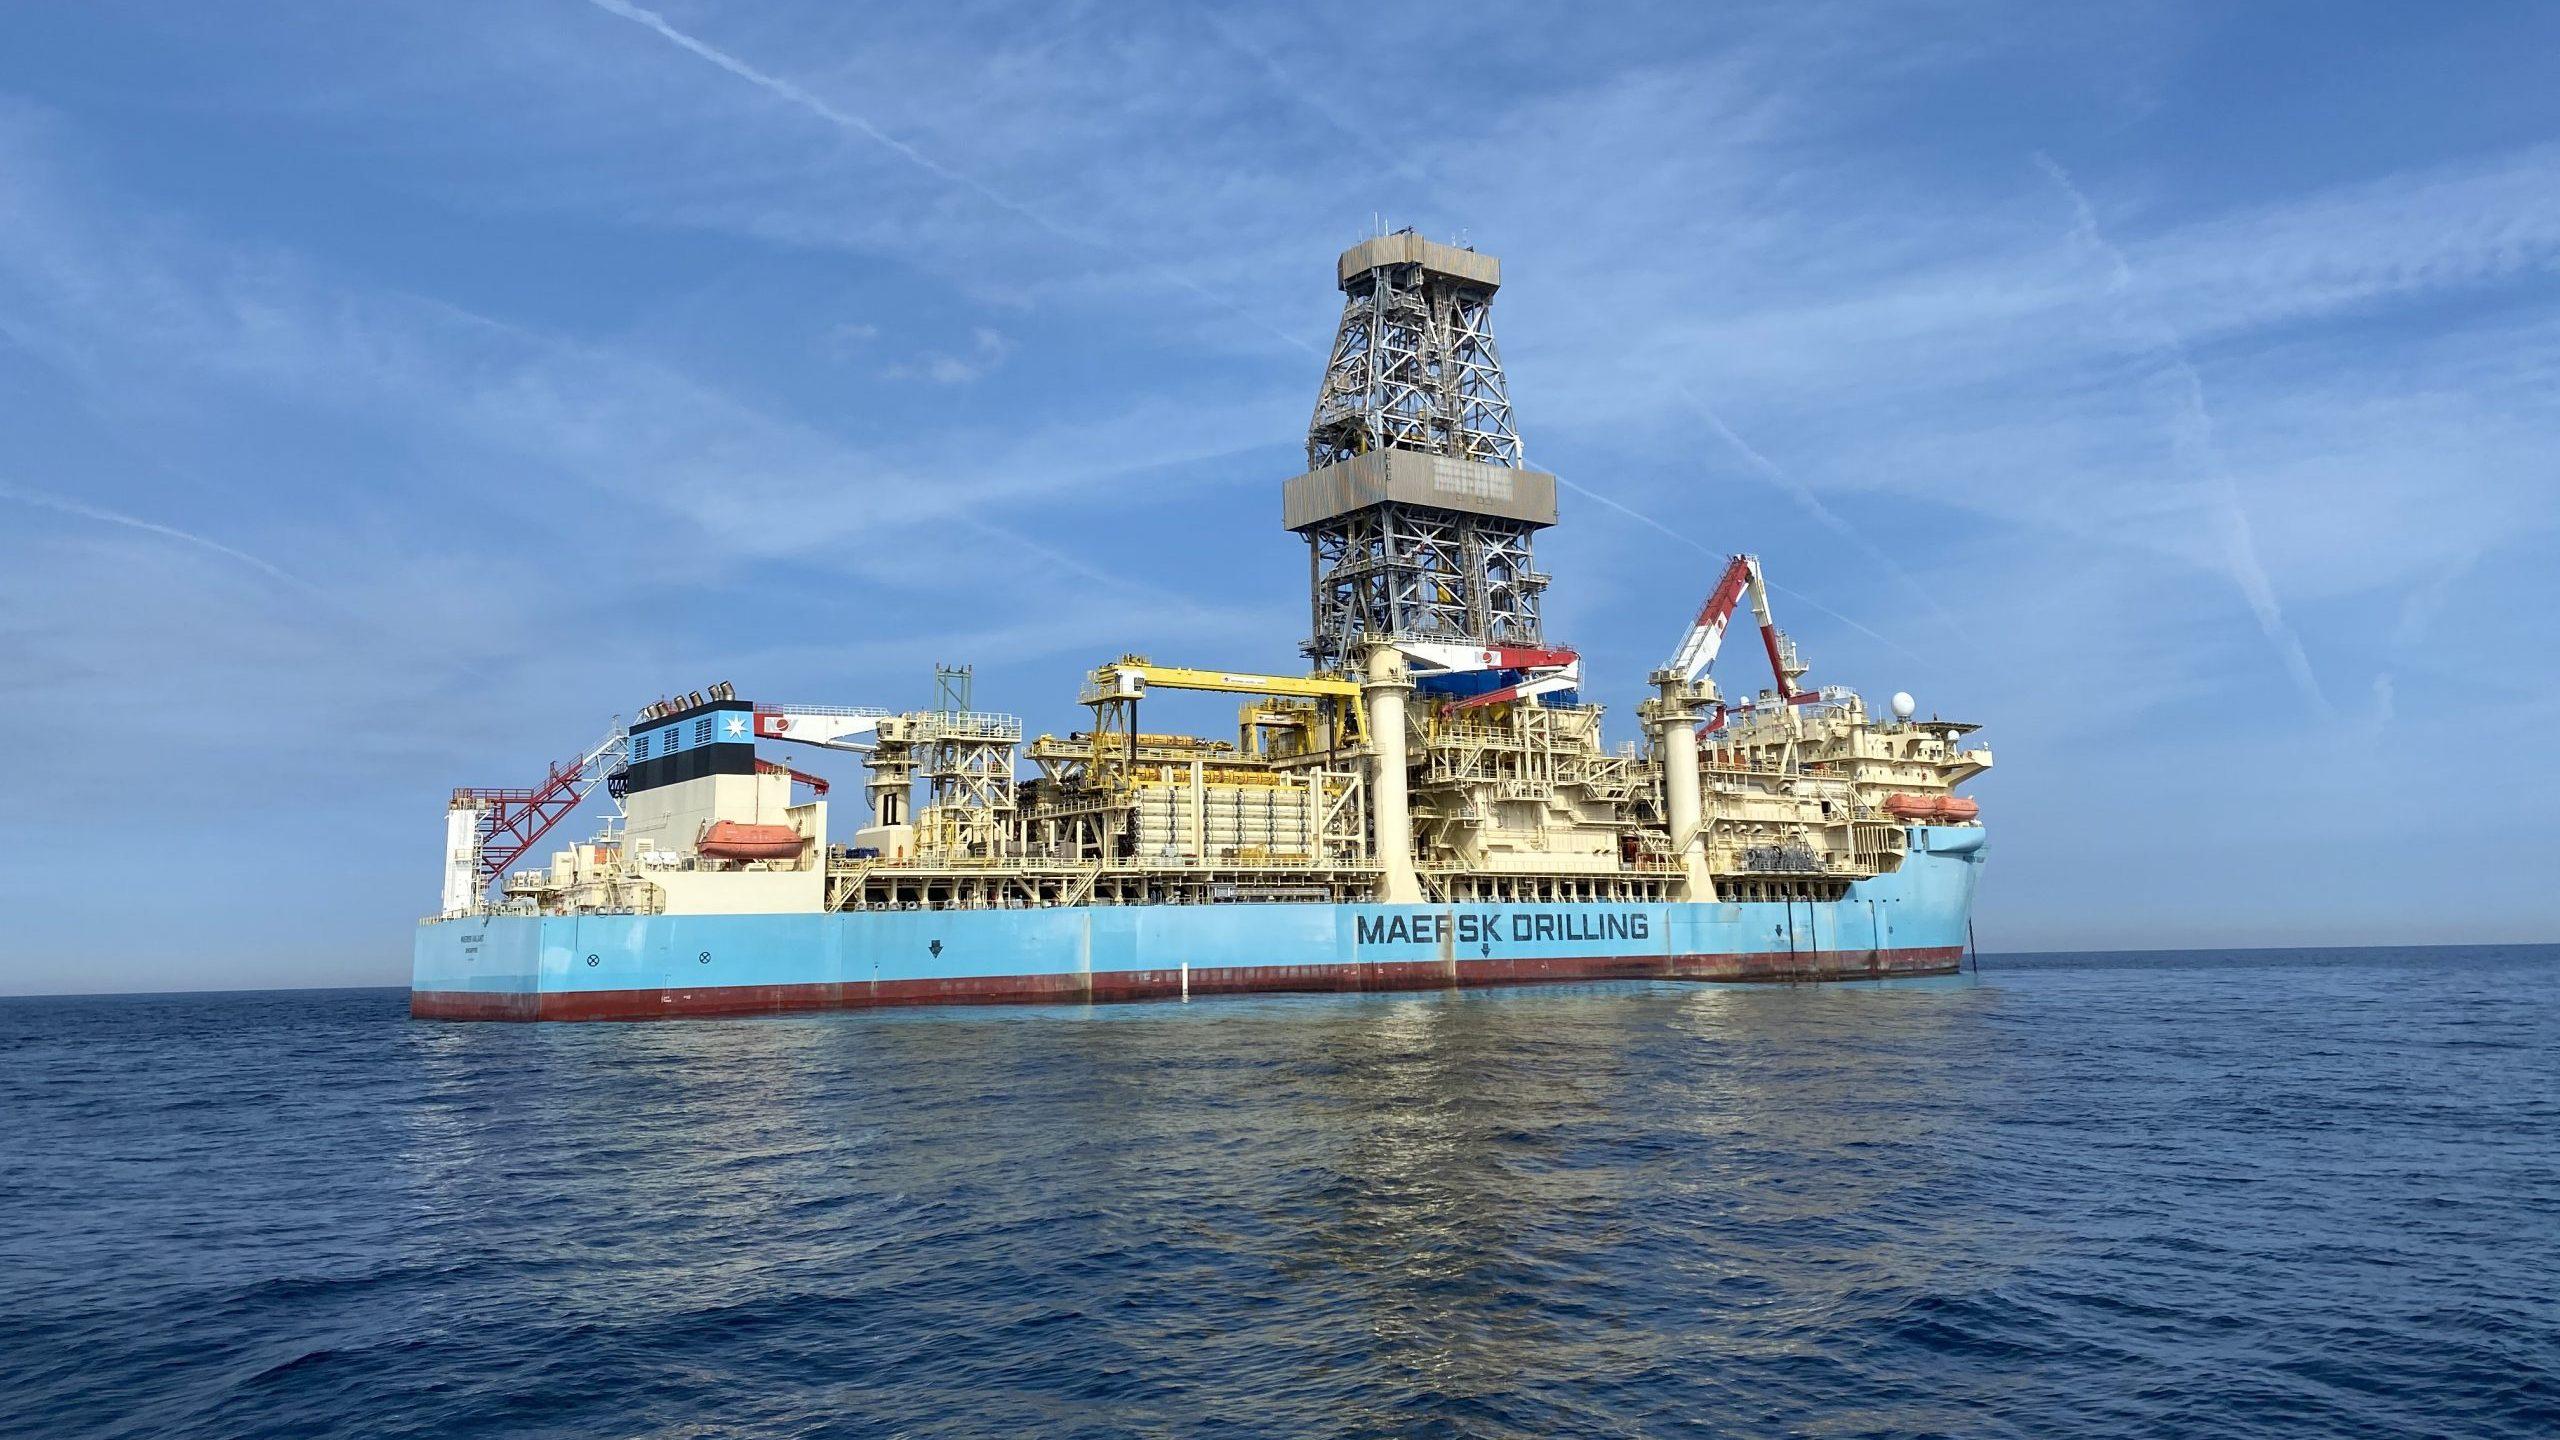 Repsol descubre 2 yacimientos petroleros en aguas profundas de México